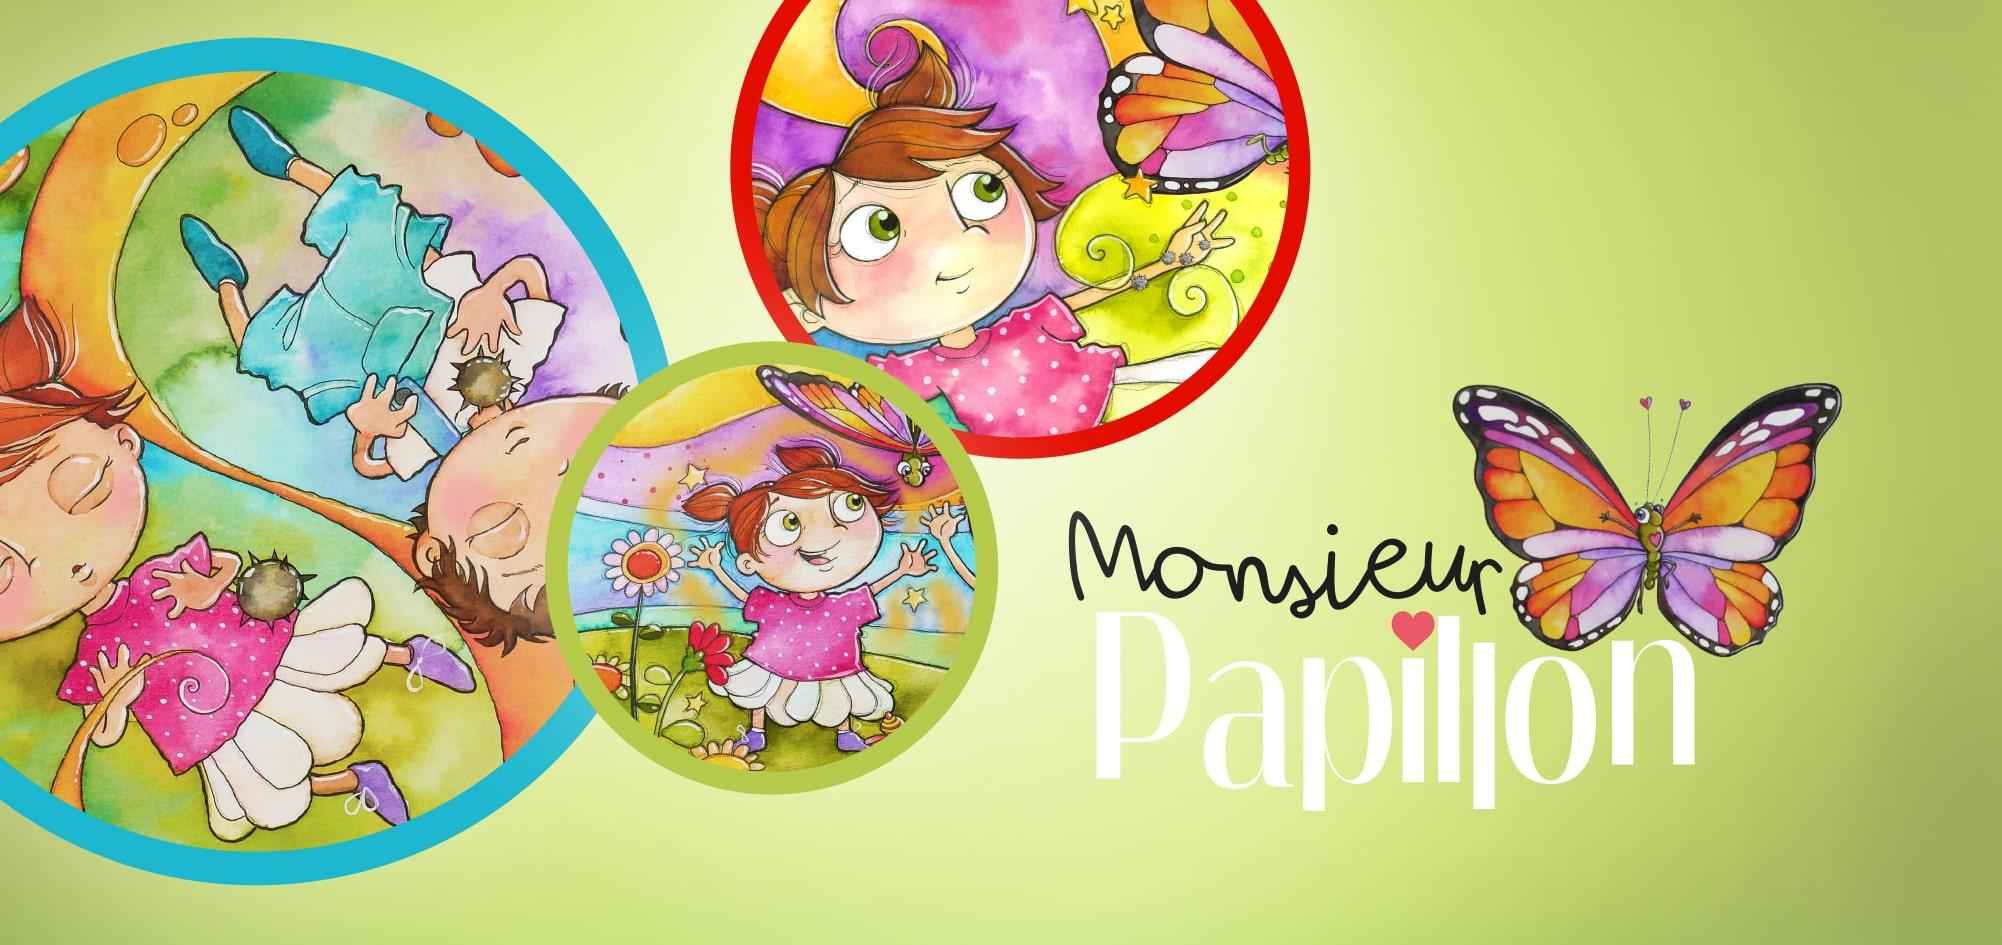 Monsieur Papillon